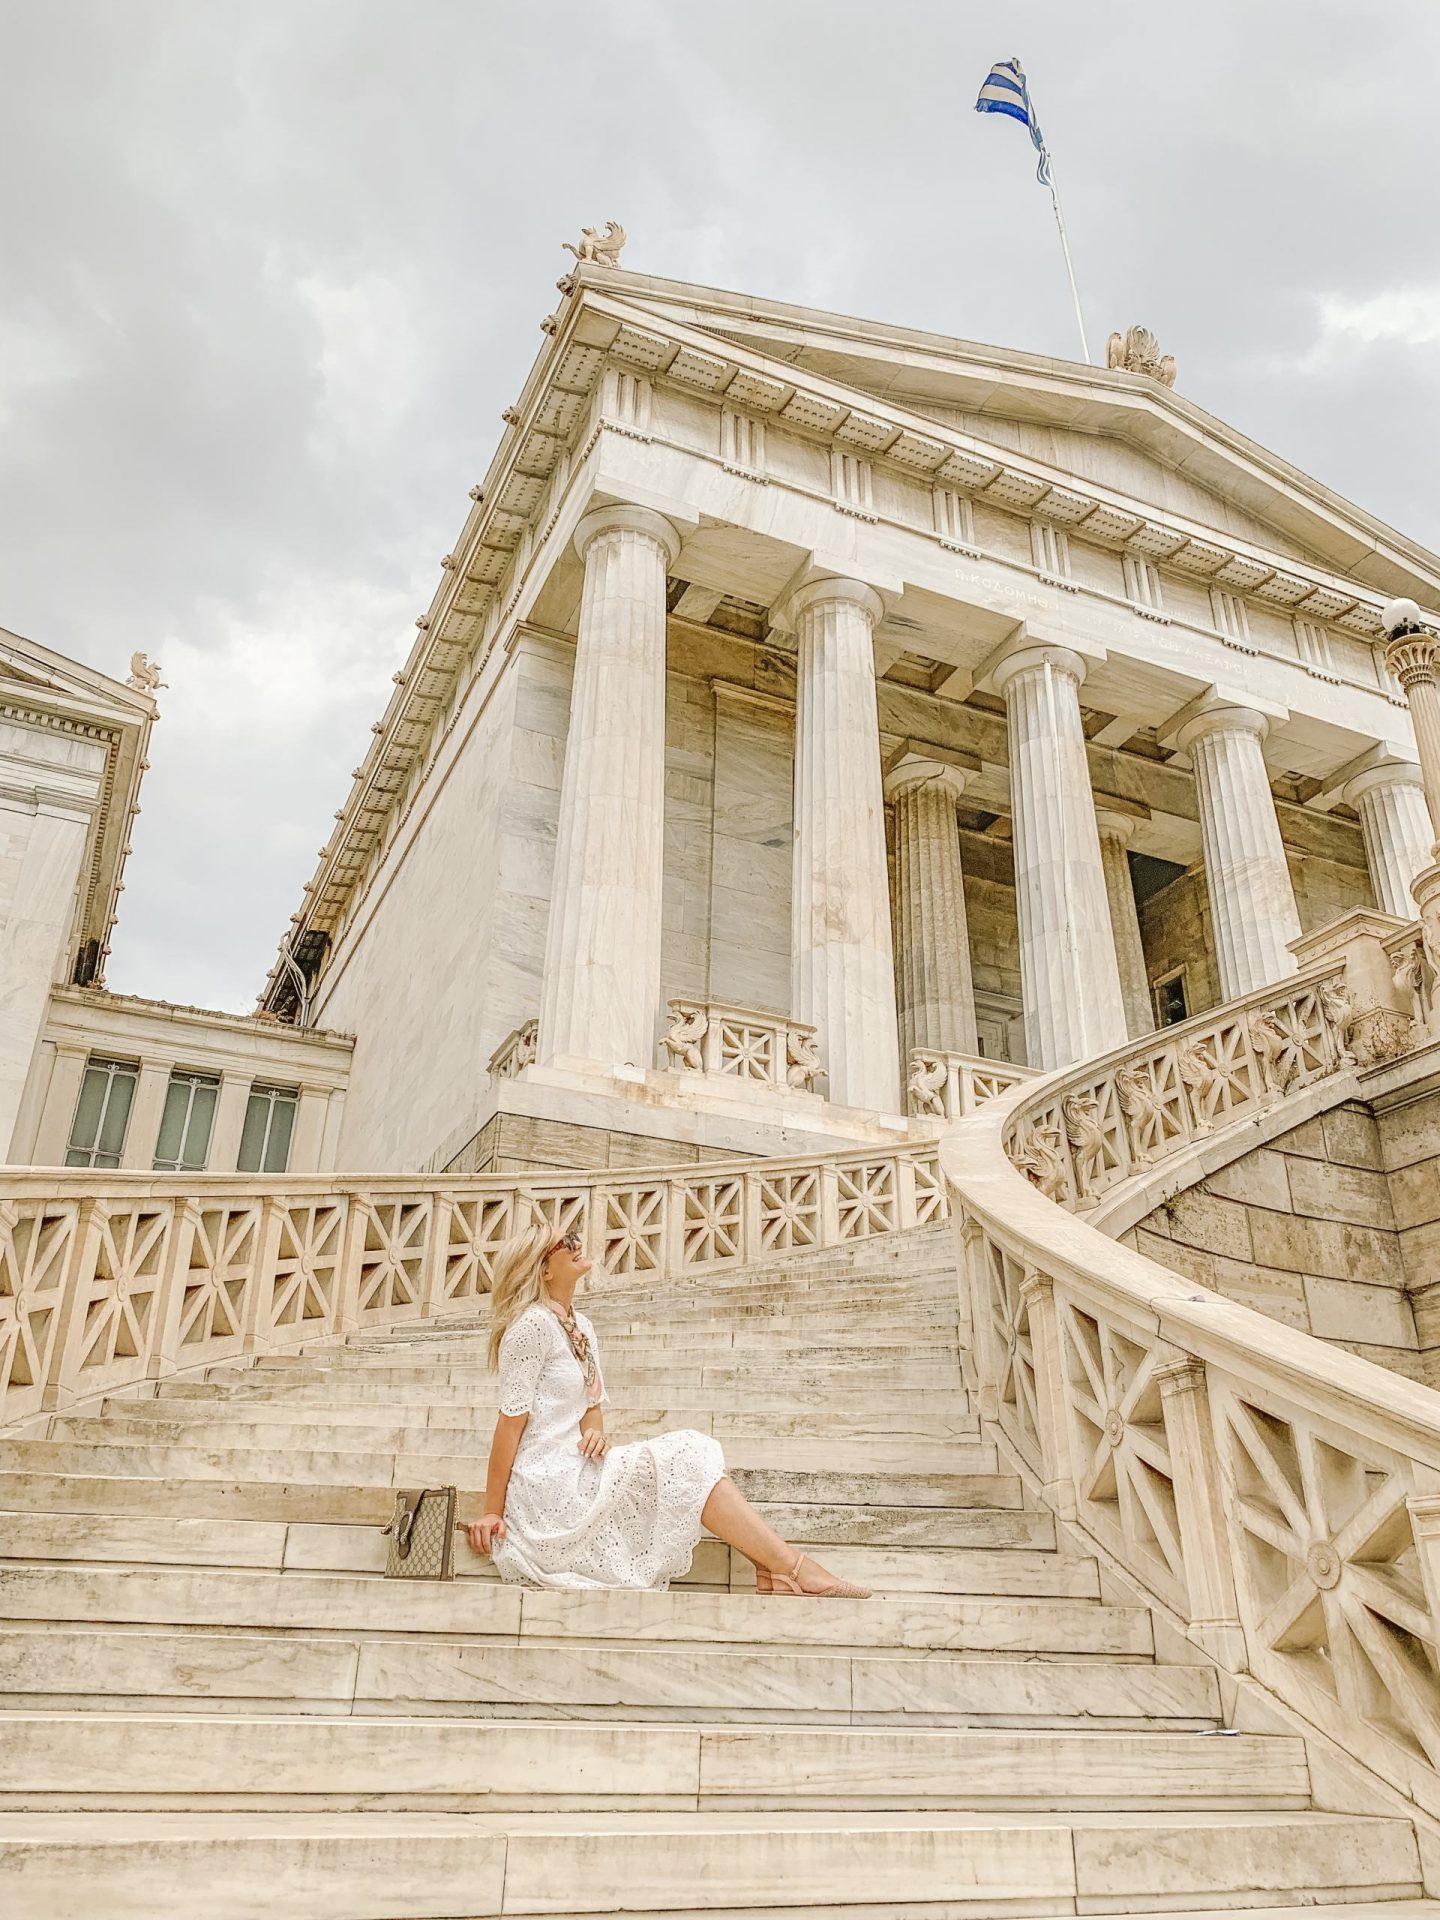 Bijuleni - National Library of Athens, Greece